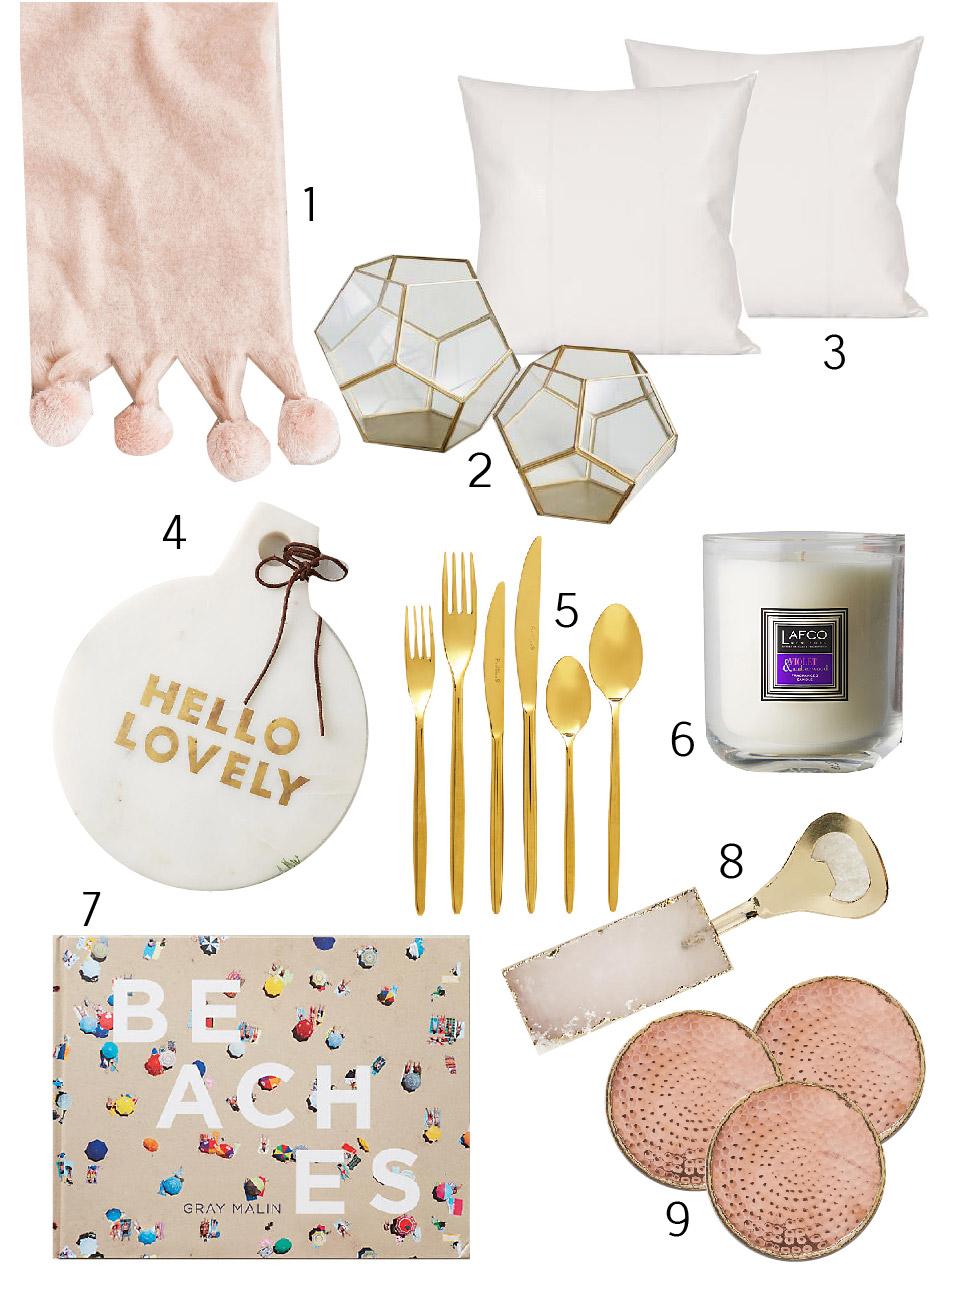 Thanksgiving hosteess gifts, beachy Thanksgiving decor, white holiday decor, blush decor